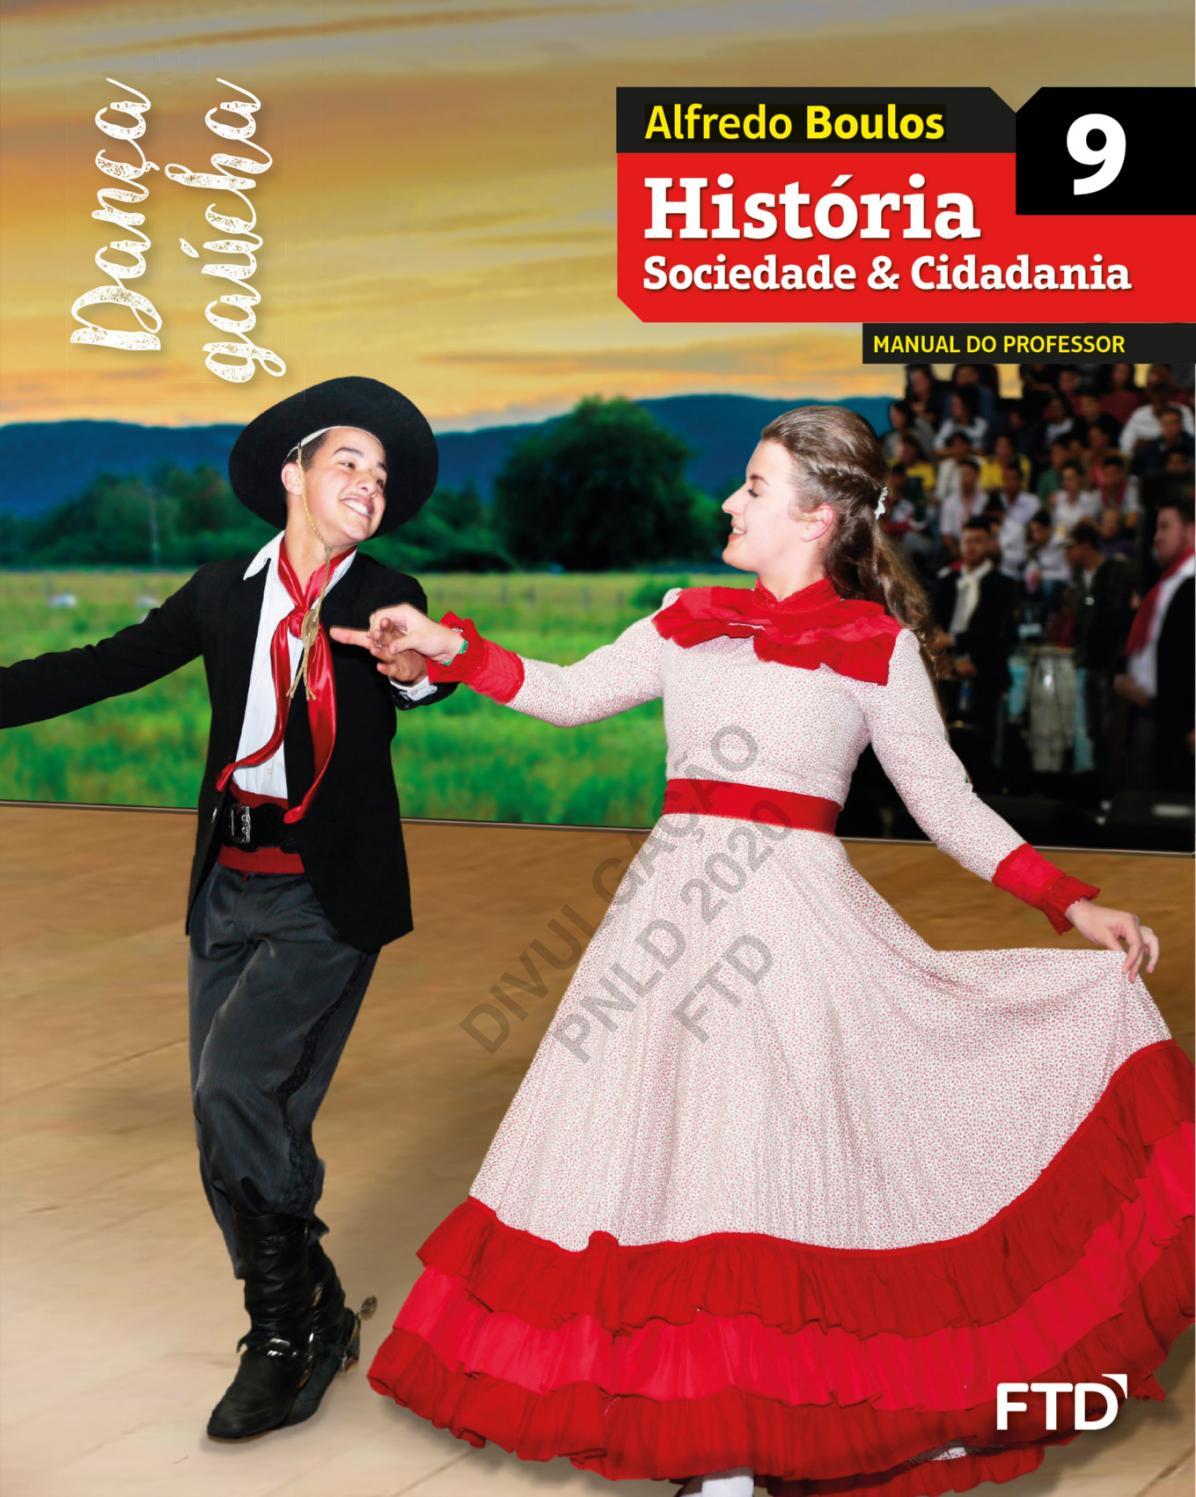 Historia Sociedade 9 By Editora Ftd Issuu